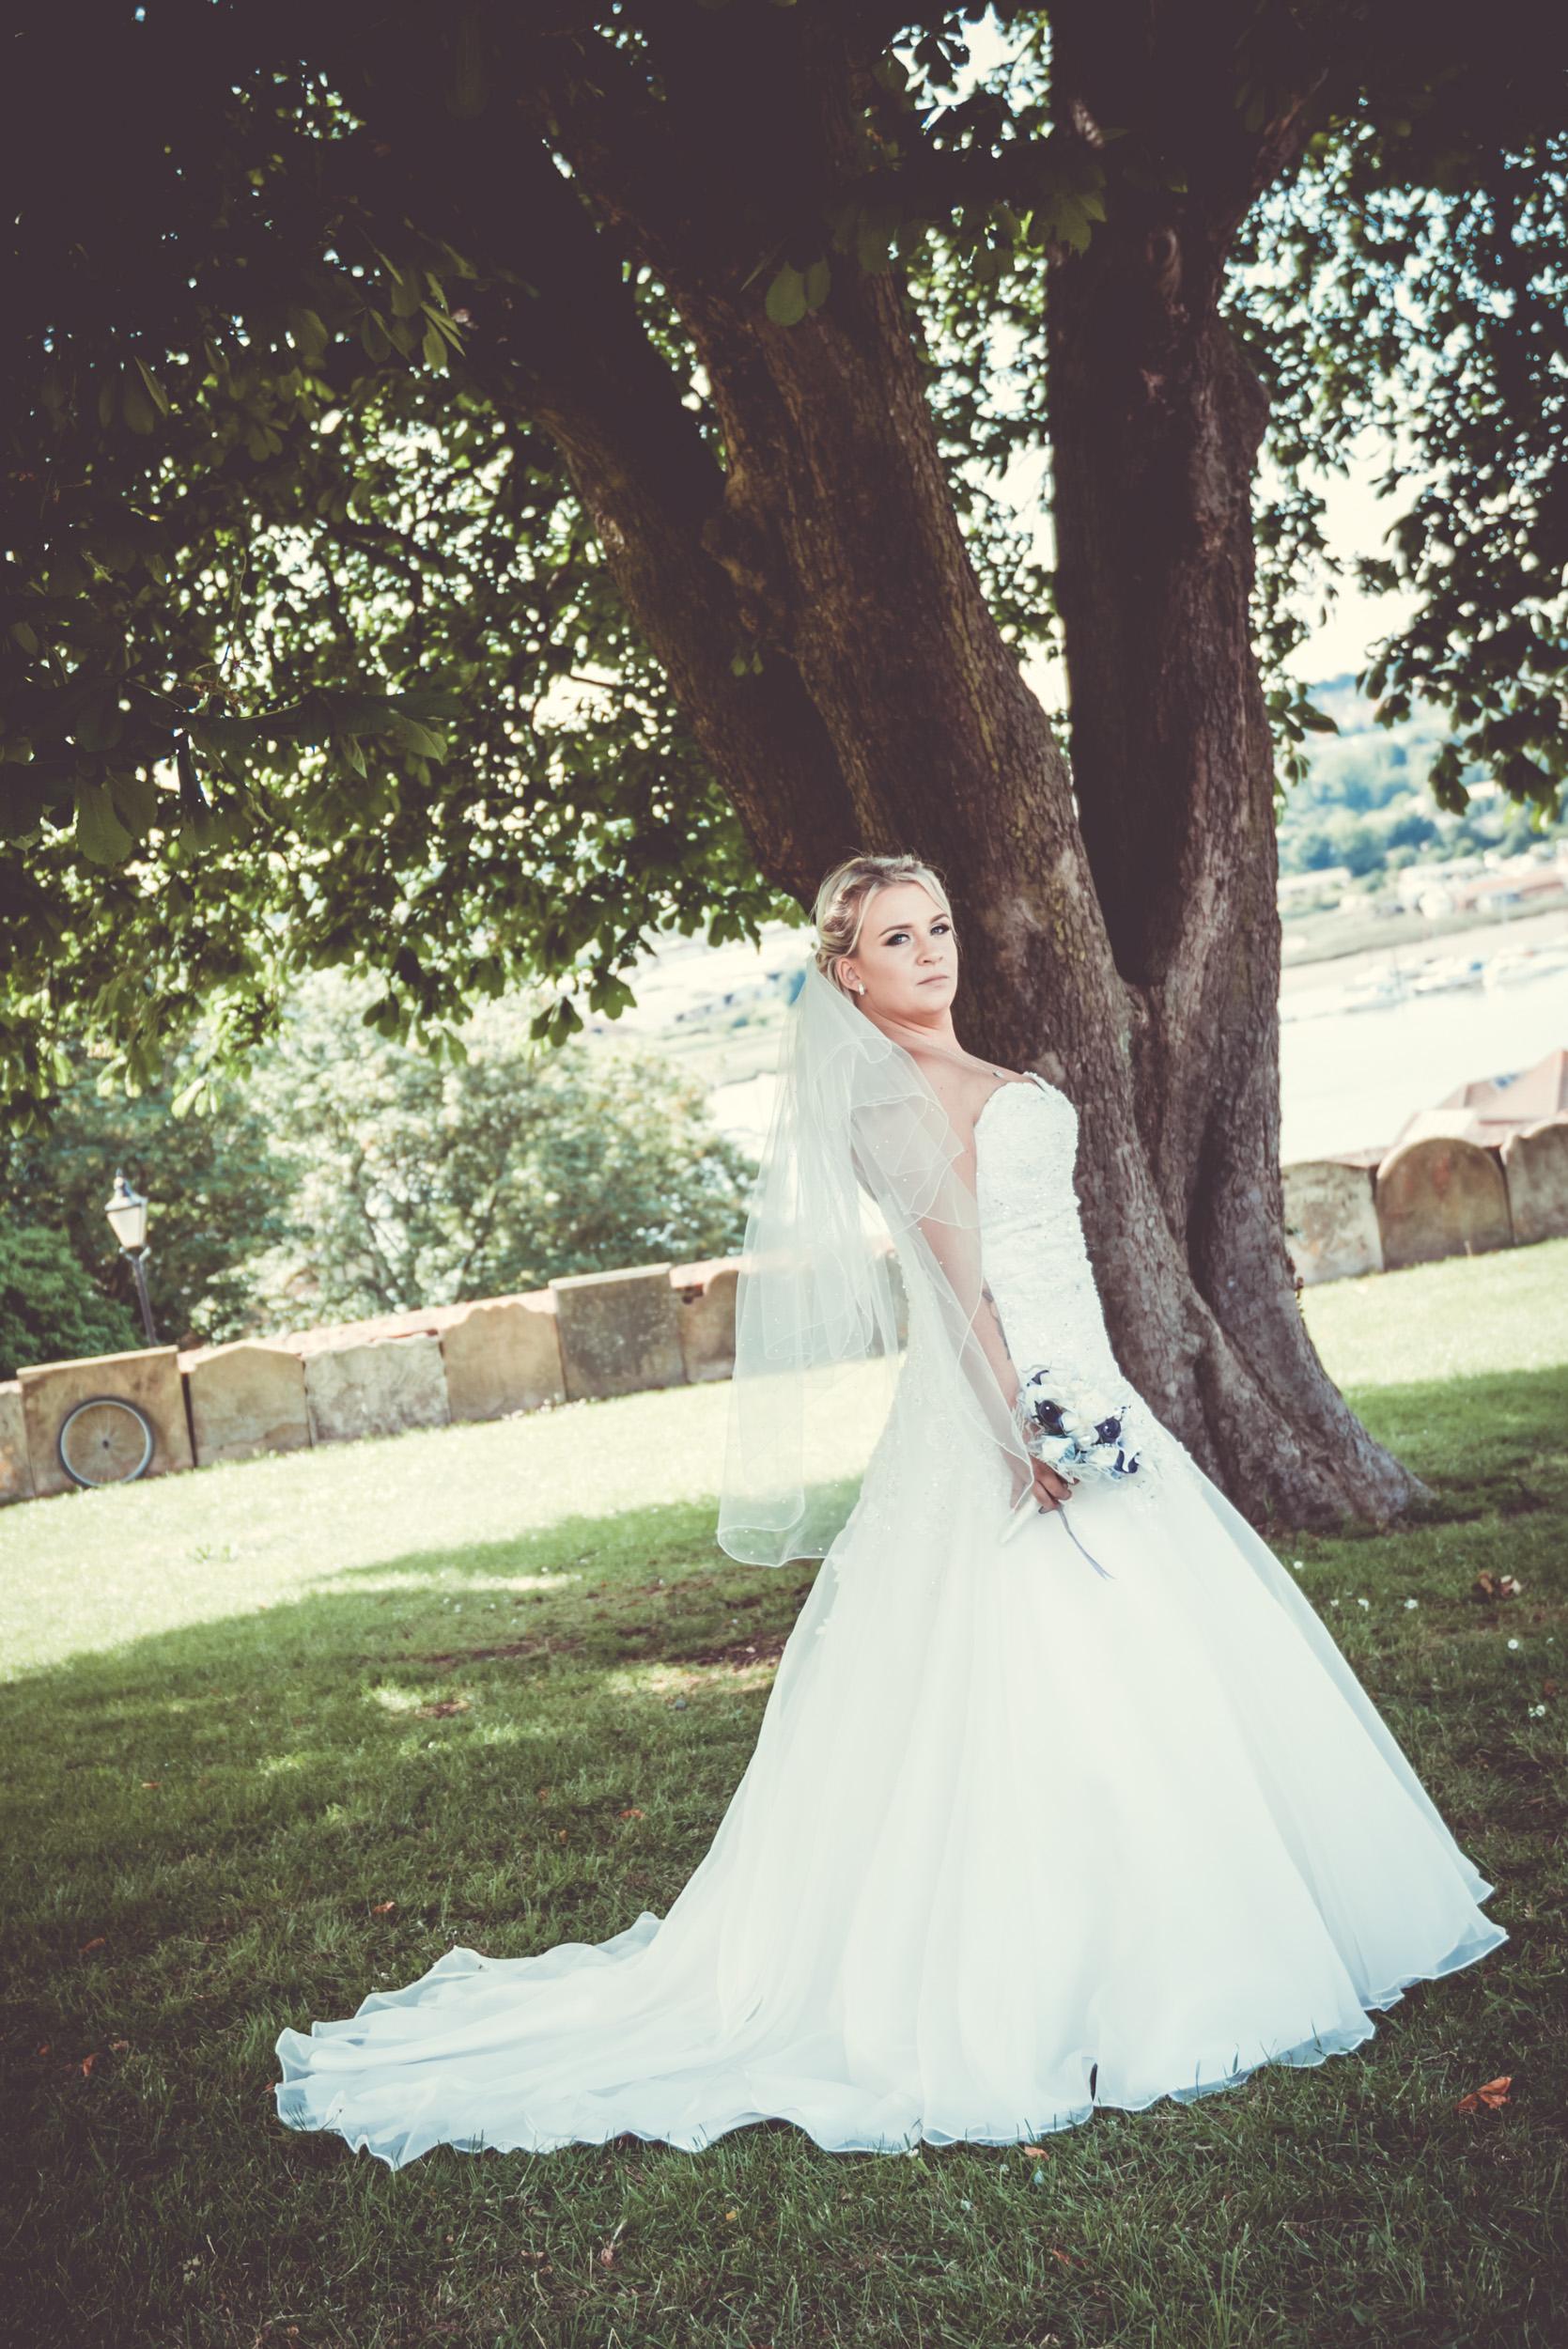 kent wedding photographer (43 of 57).jpg